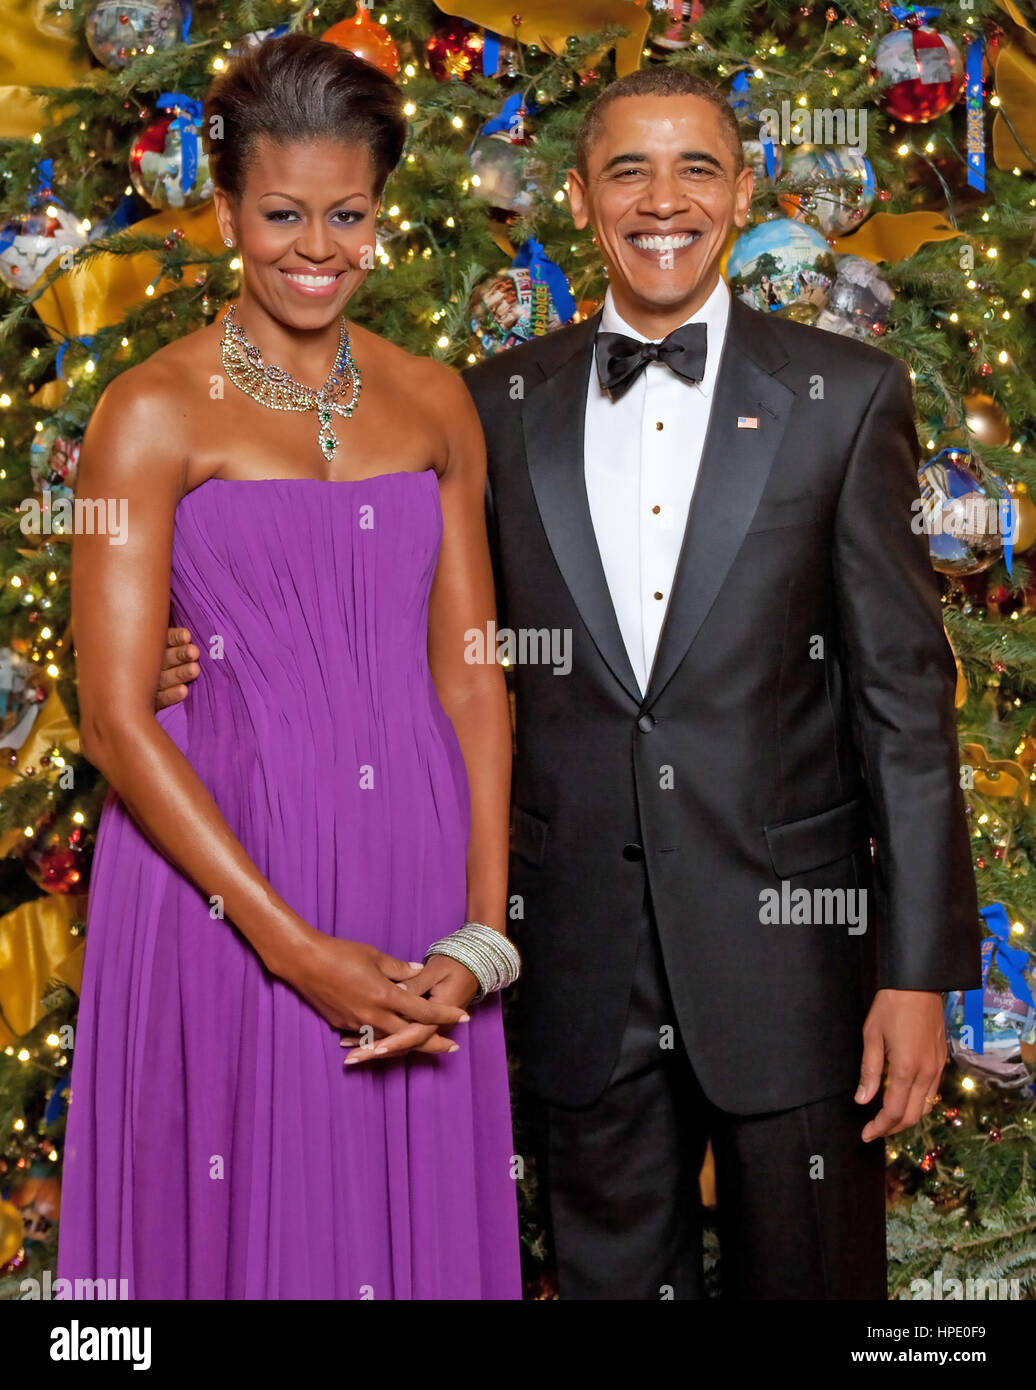 President Obama Christmas Stock Photos & President Obama Christmas ...